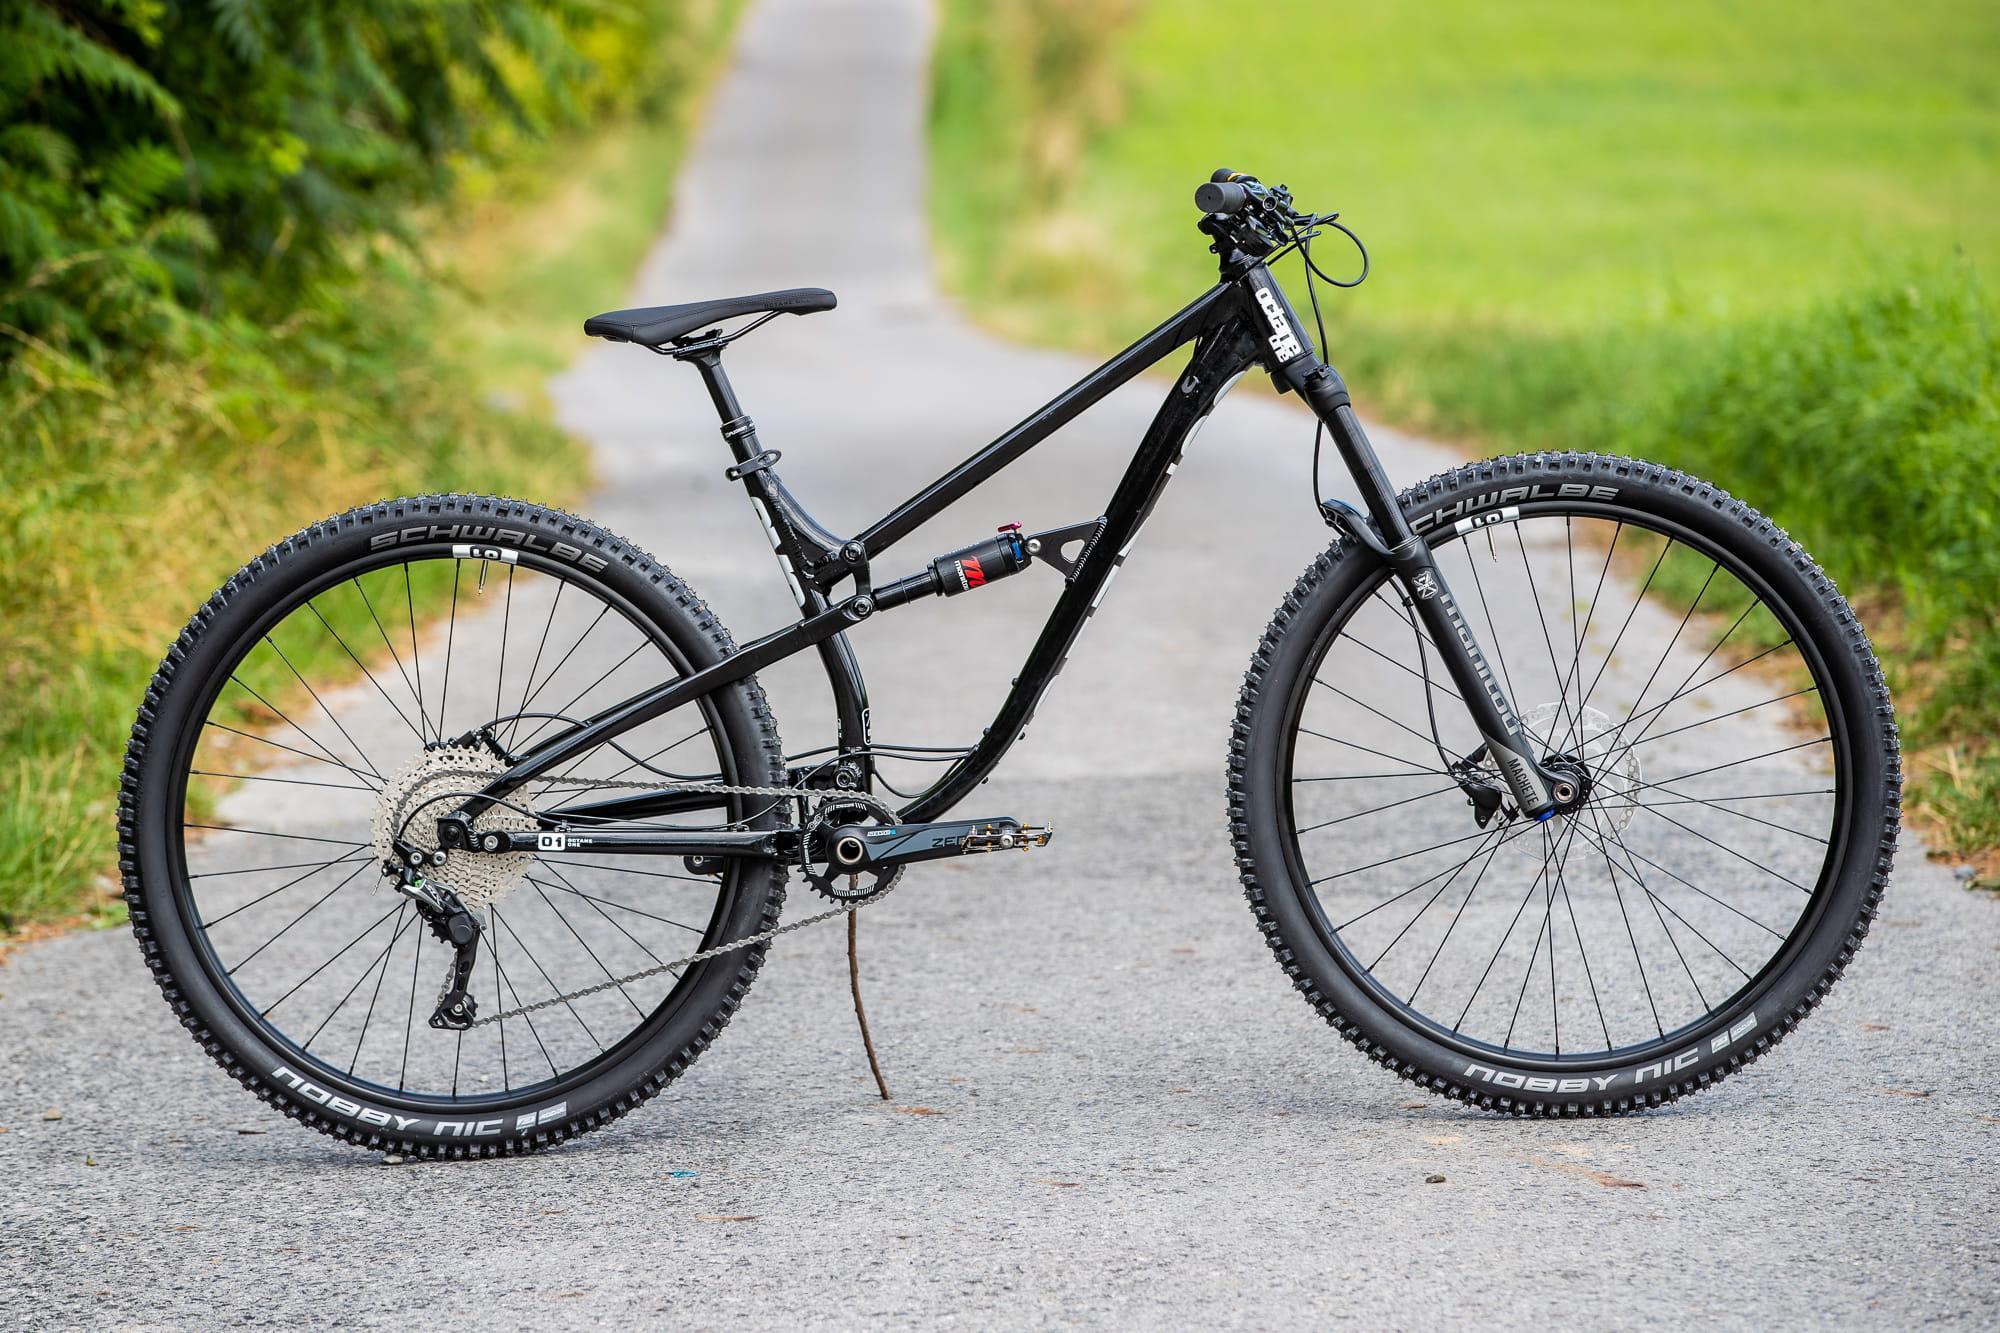 Octane-One-OMG-Bike-Mailorder-1H4yBcLdkuoea2